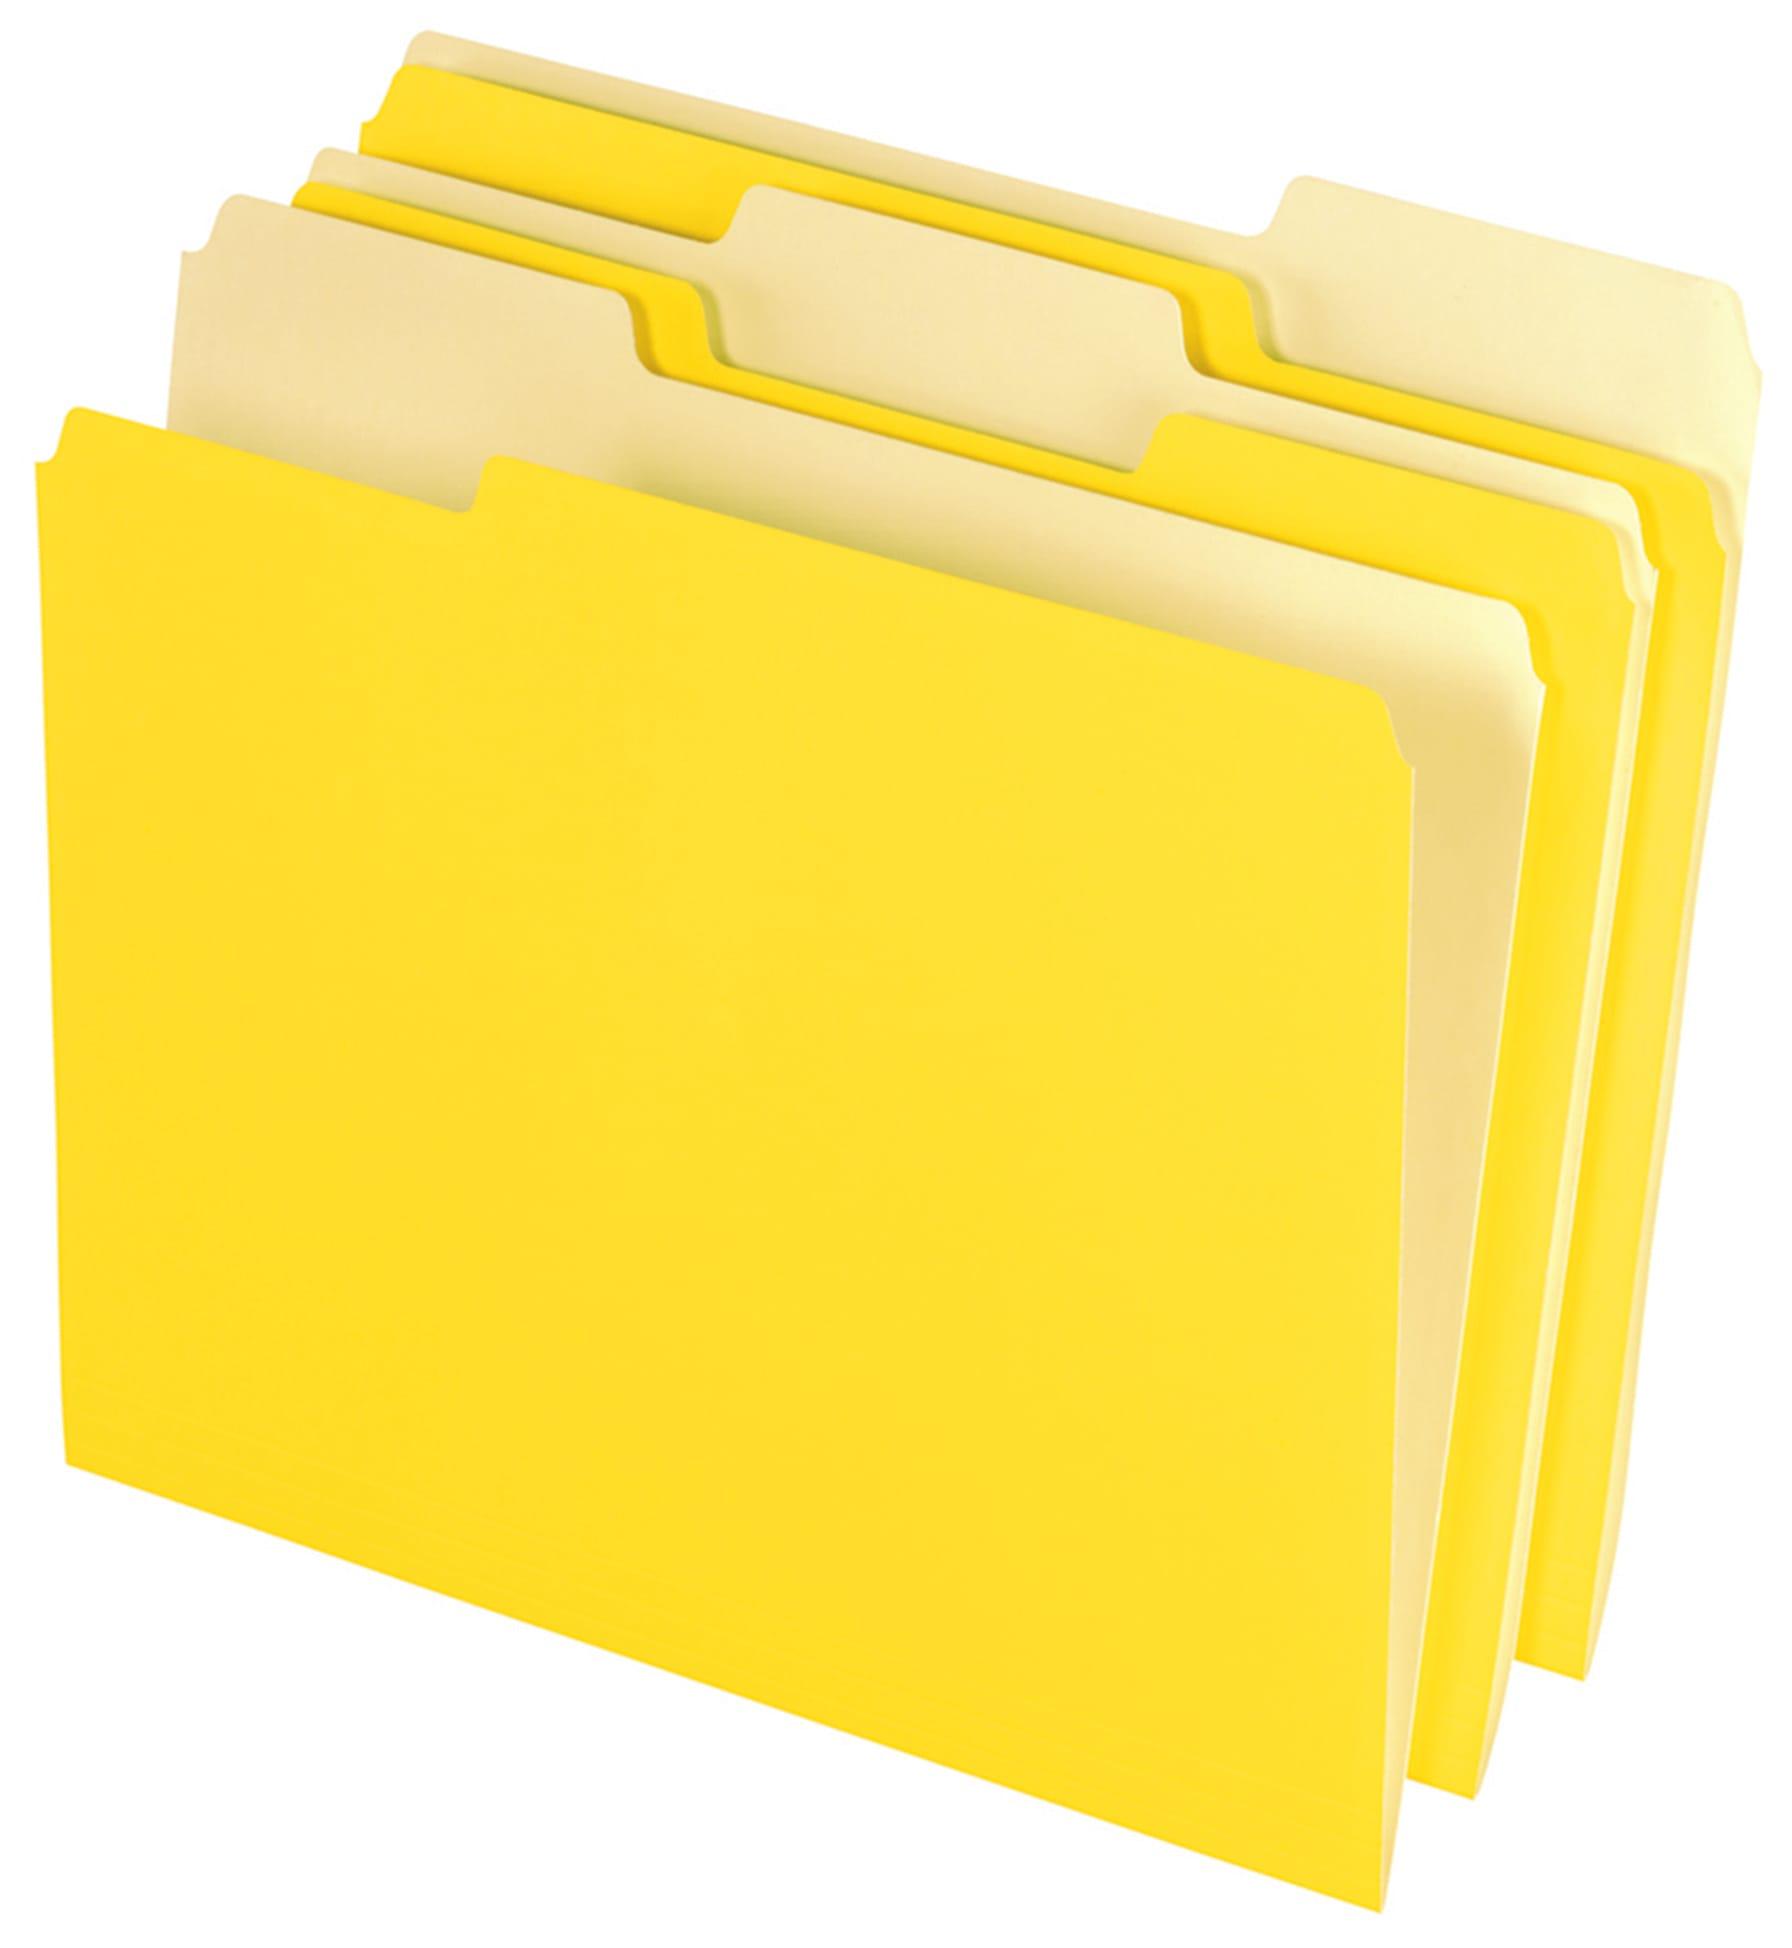 Office Depot® Brand Interior File Folders, 1/3 Tab Cut, Letter Size, Yellow, Box Of 100 Folders